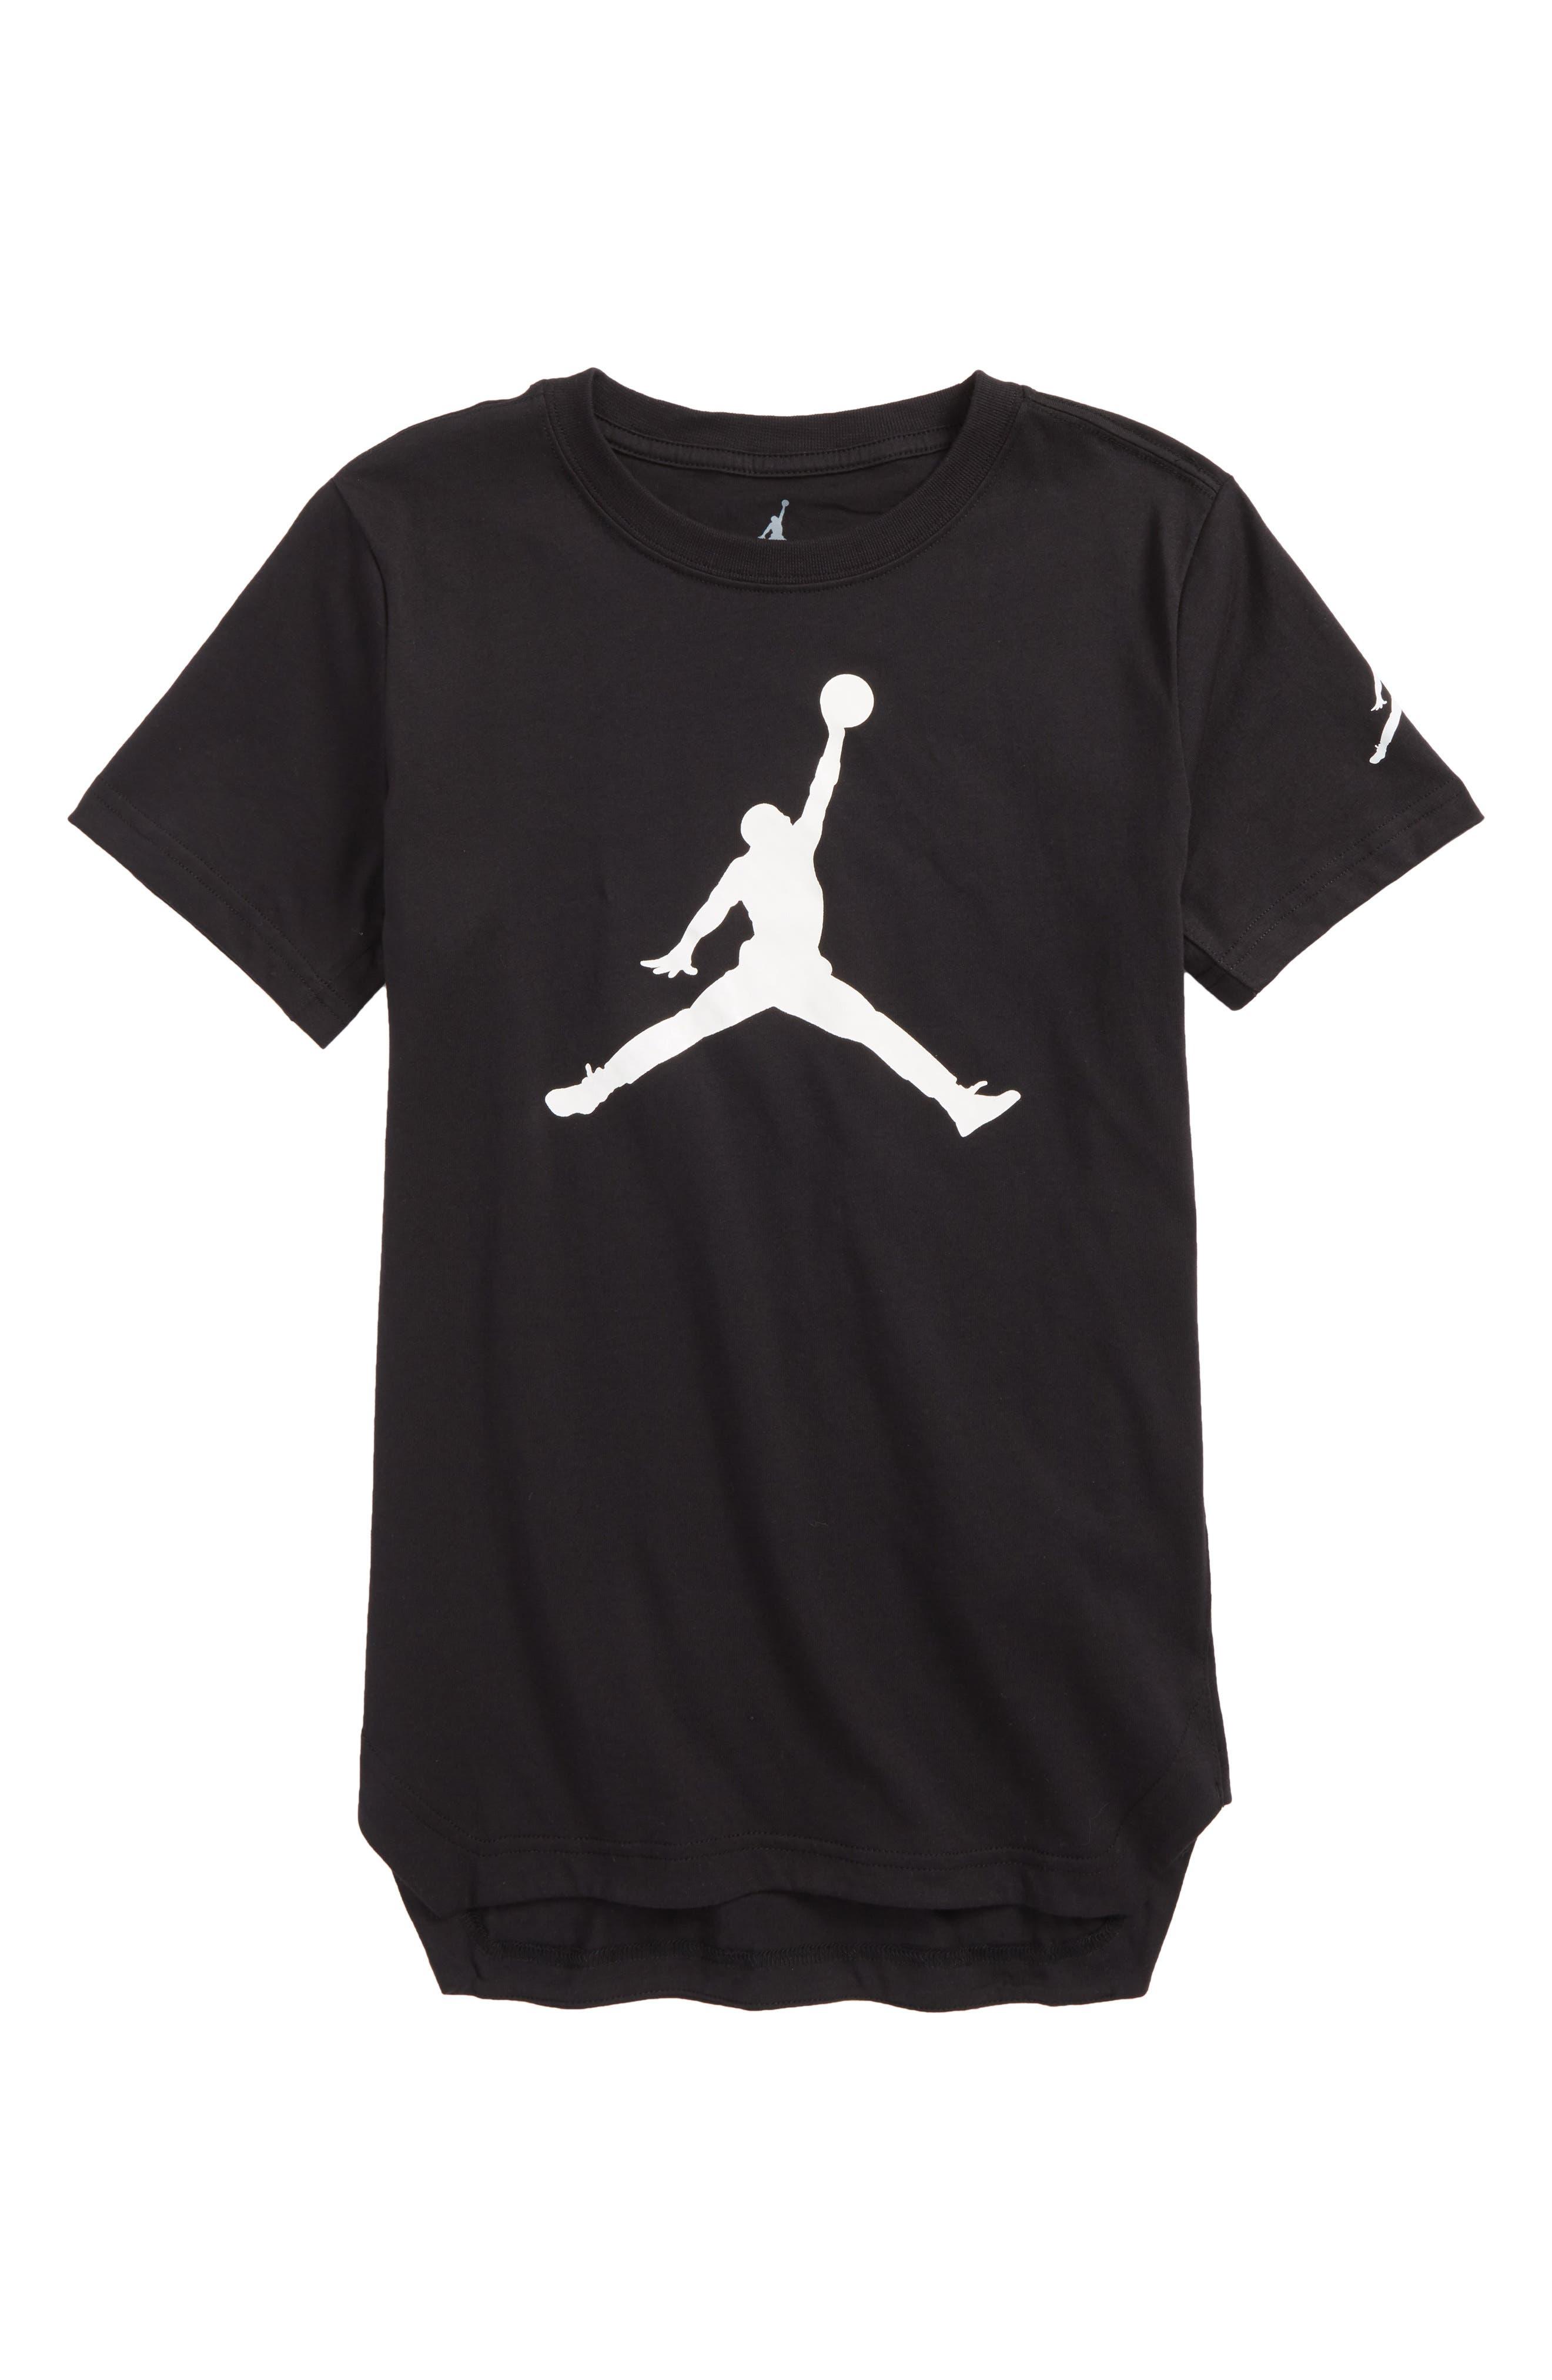 Main Image - Jordan Jumpman Brand T-Shirt (Big Boys)